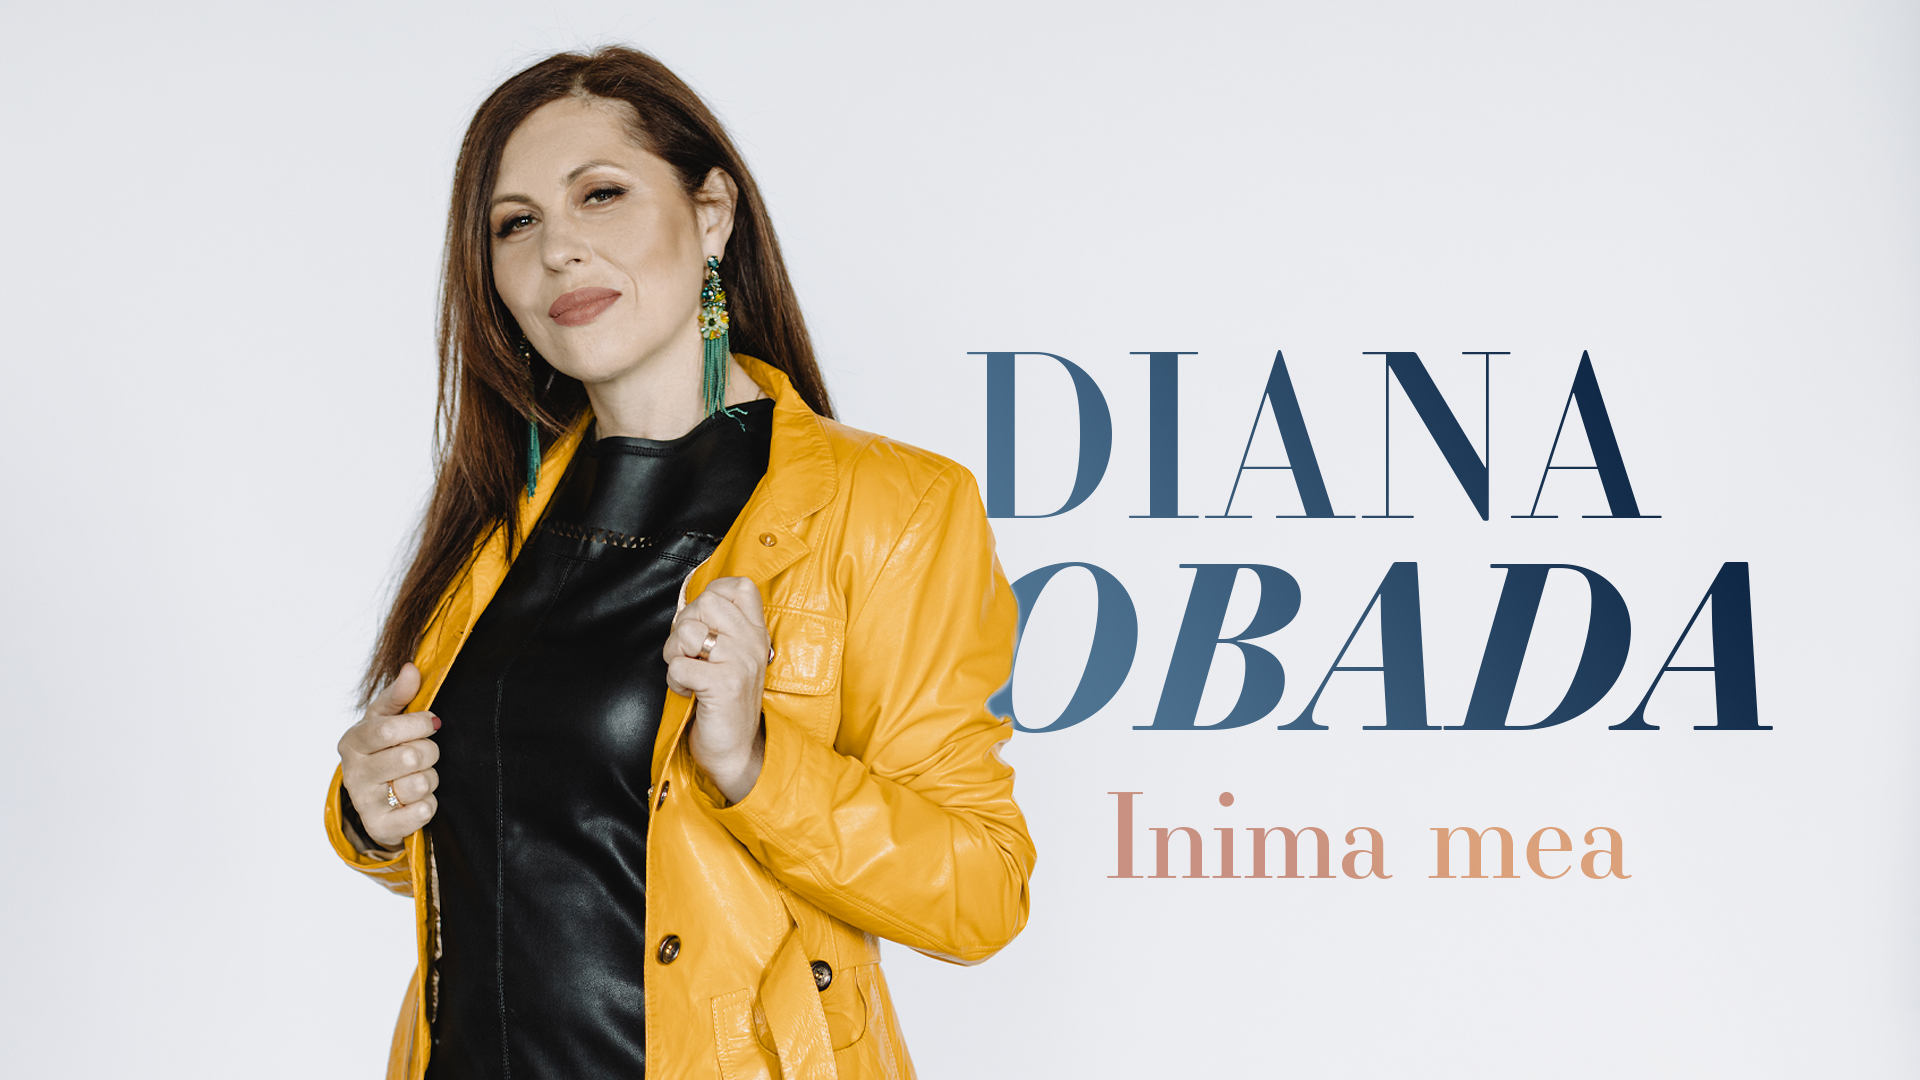 Diana Obada 1